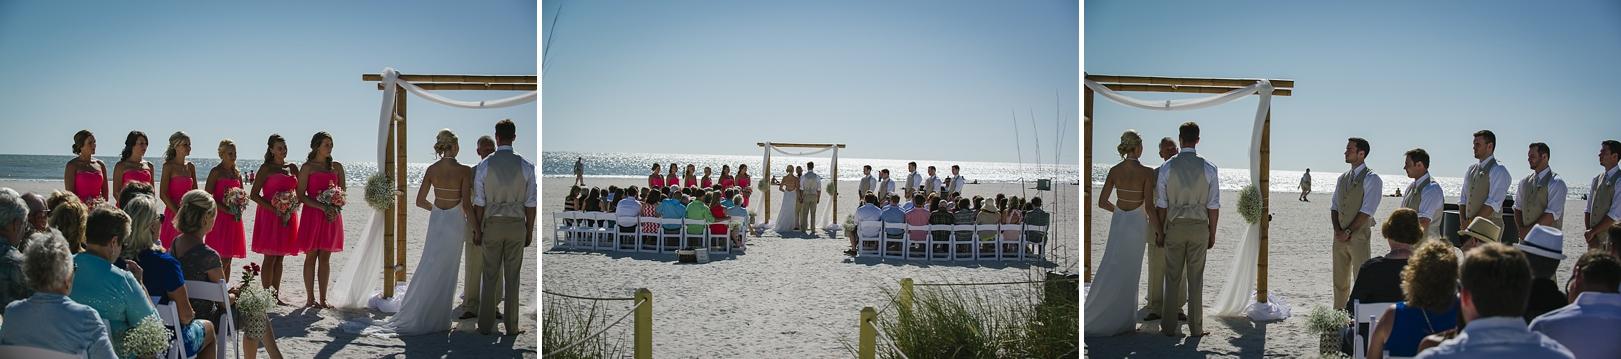 sirata beach wedding photos ceremony